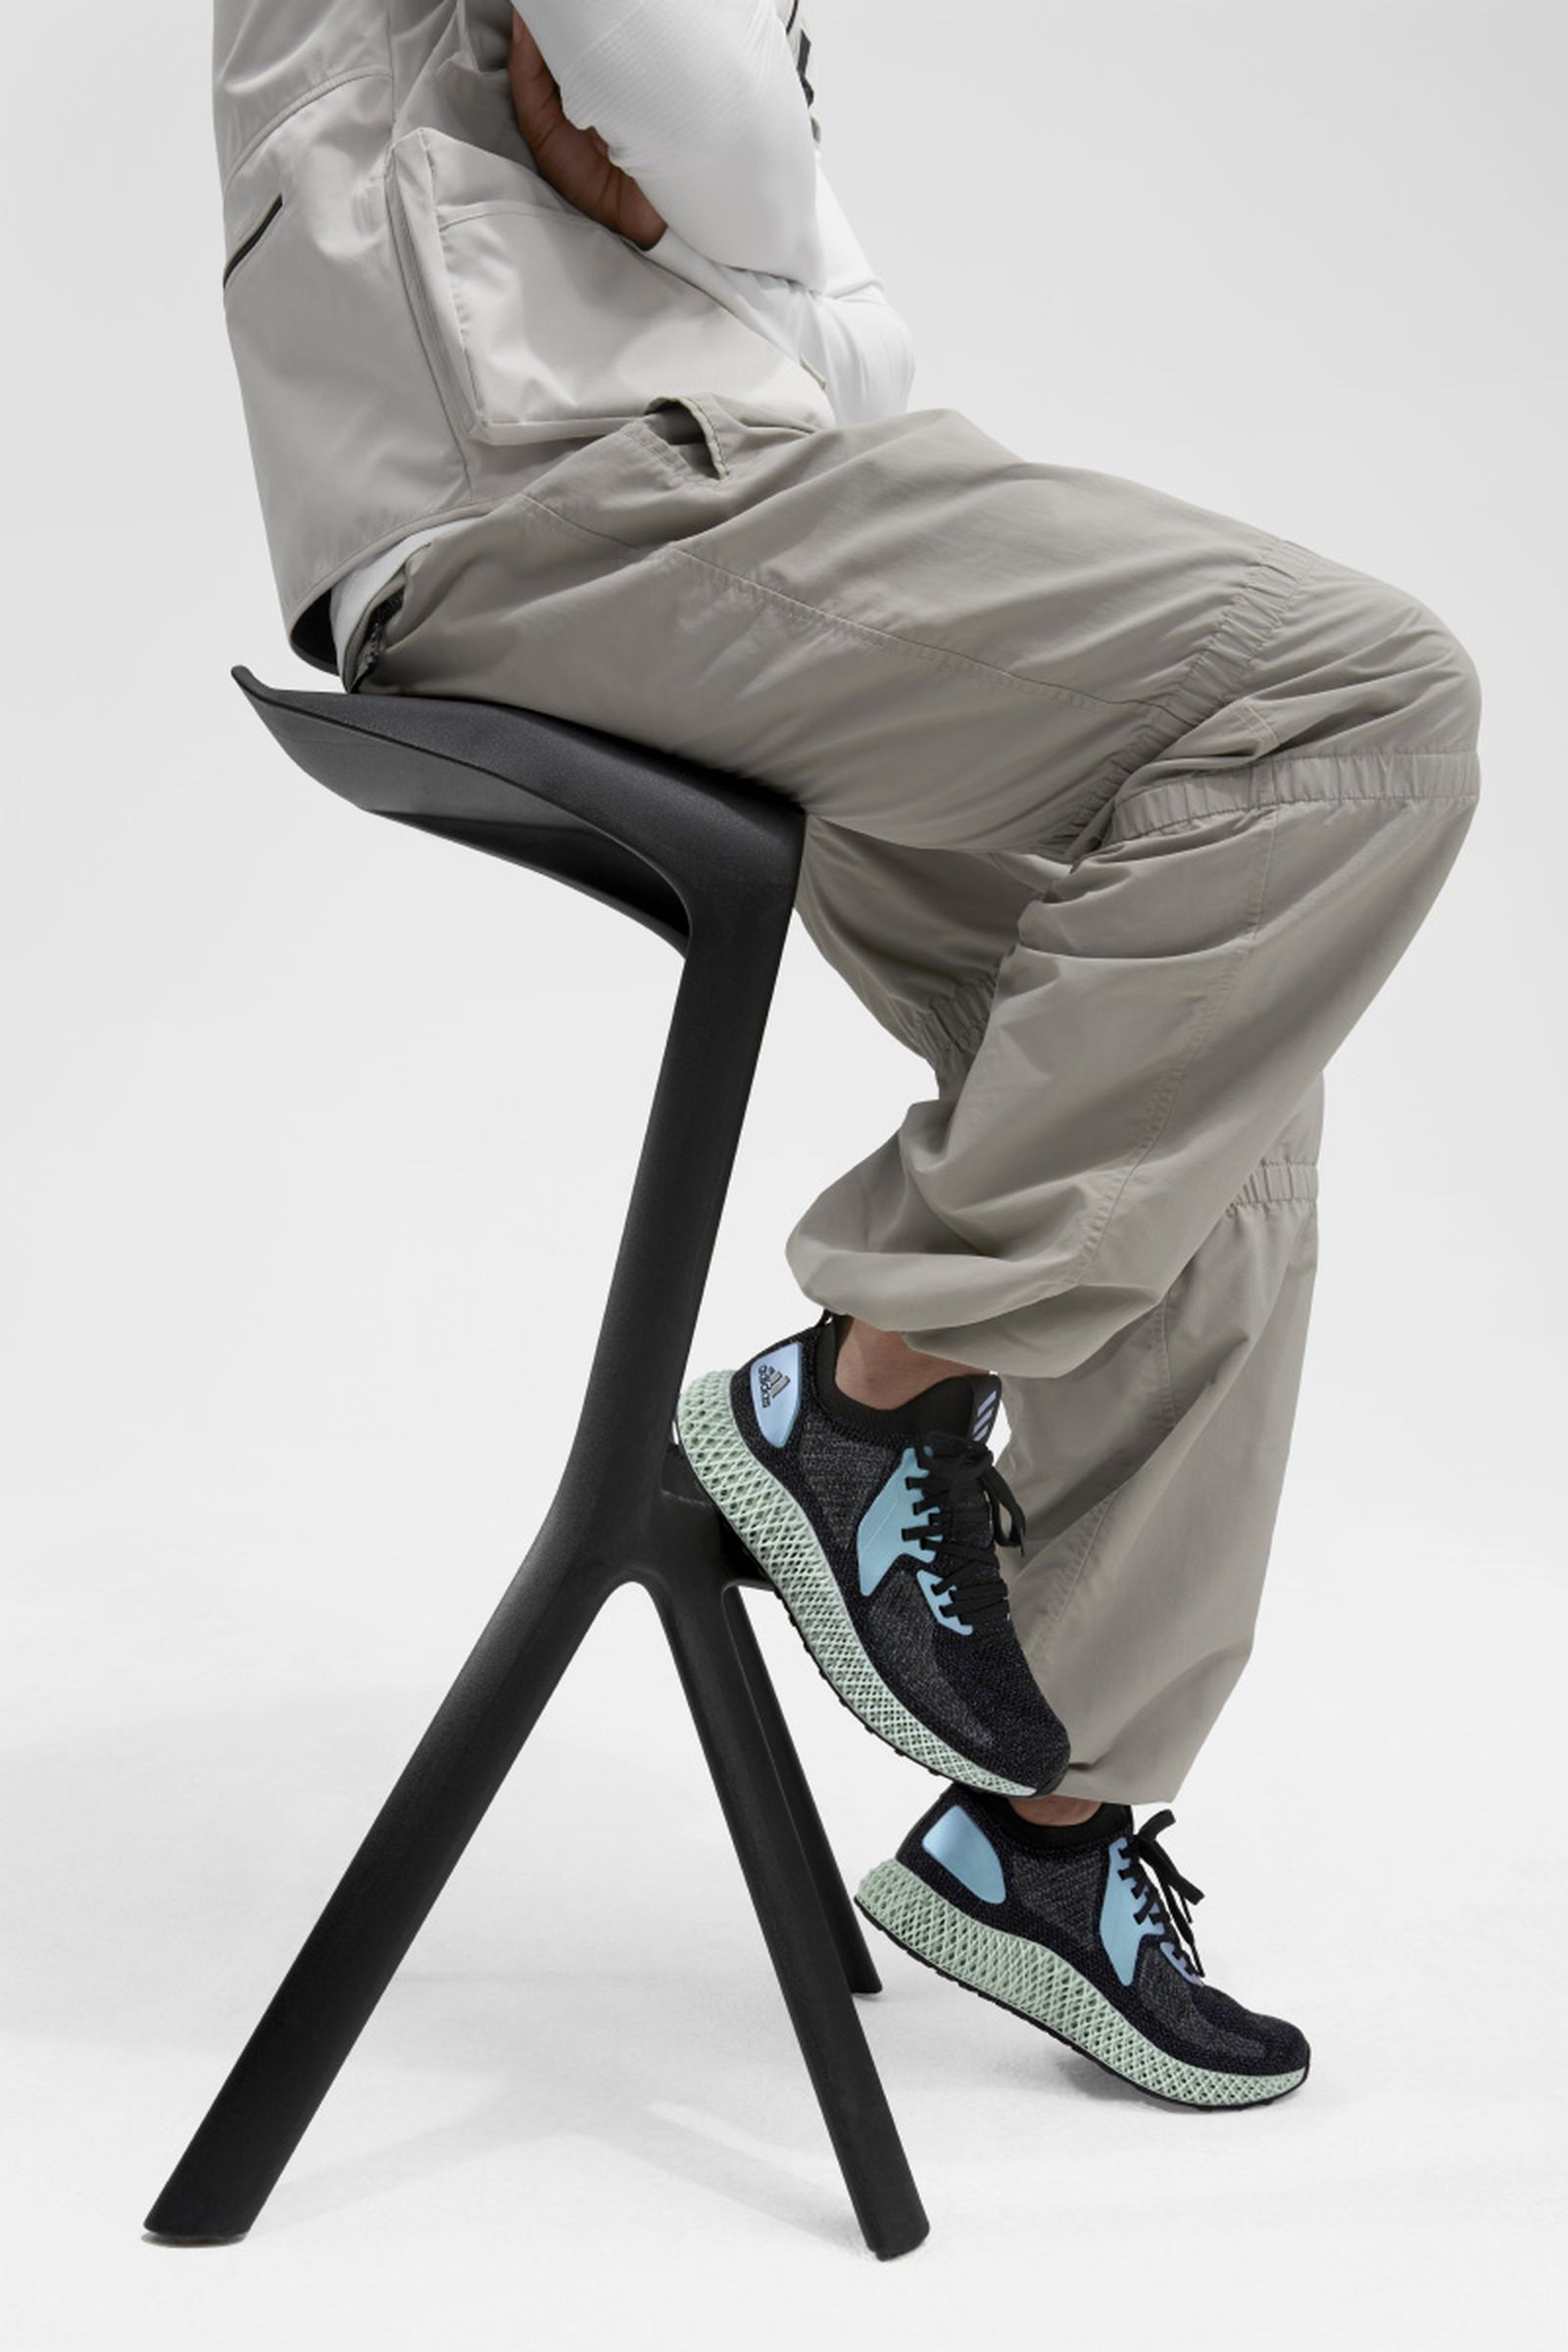 adidas-alphaedge-4d-goodbye-gravity-03